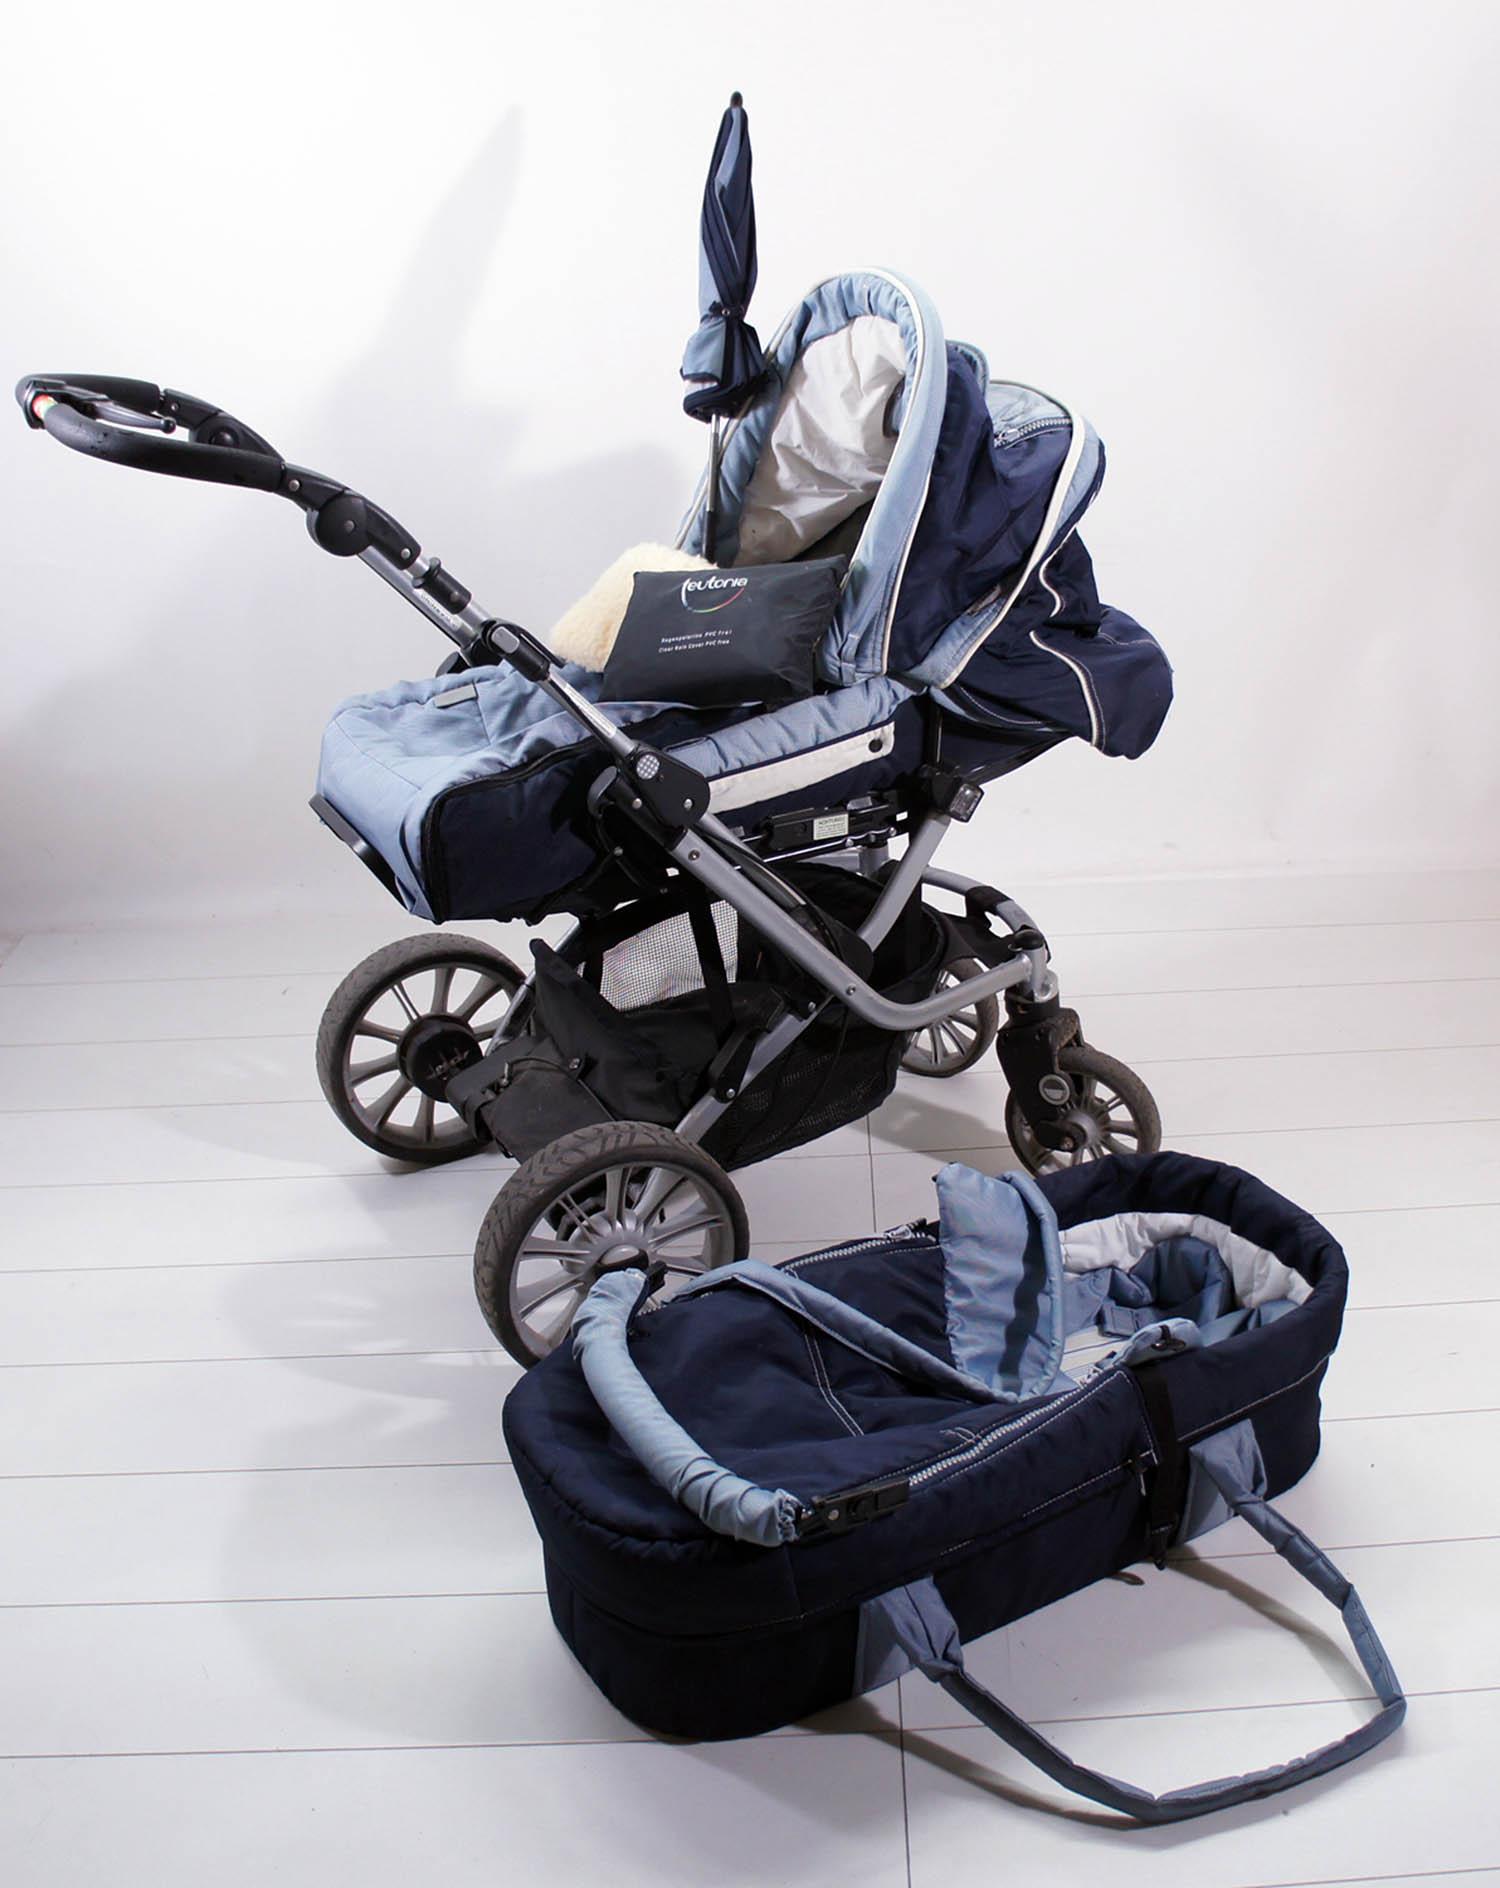 teutonia mistral s collection 2007 kinderwagen blau. Black Bedroom Furniture Sets. Home Design Ideas